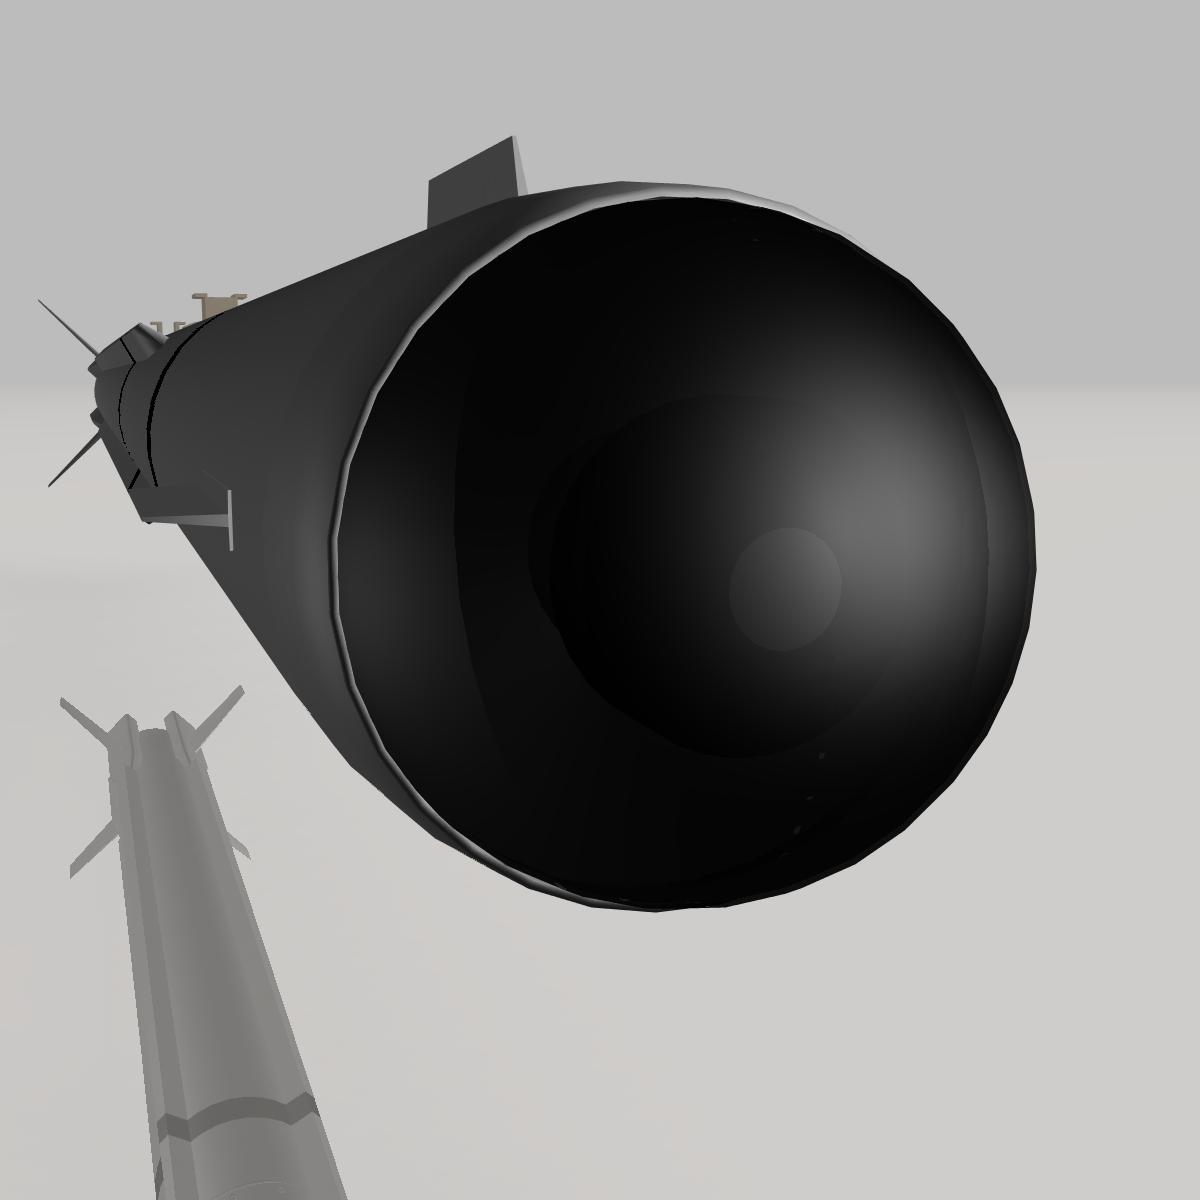 a-darter air-to-air пуужин 3d загвар 3ds dxf cob x obj 151885